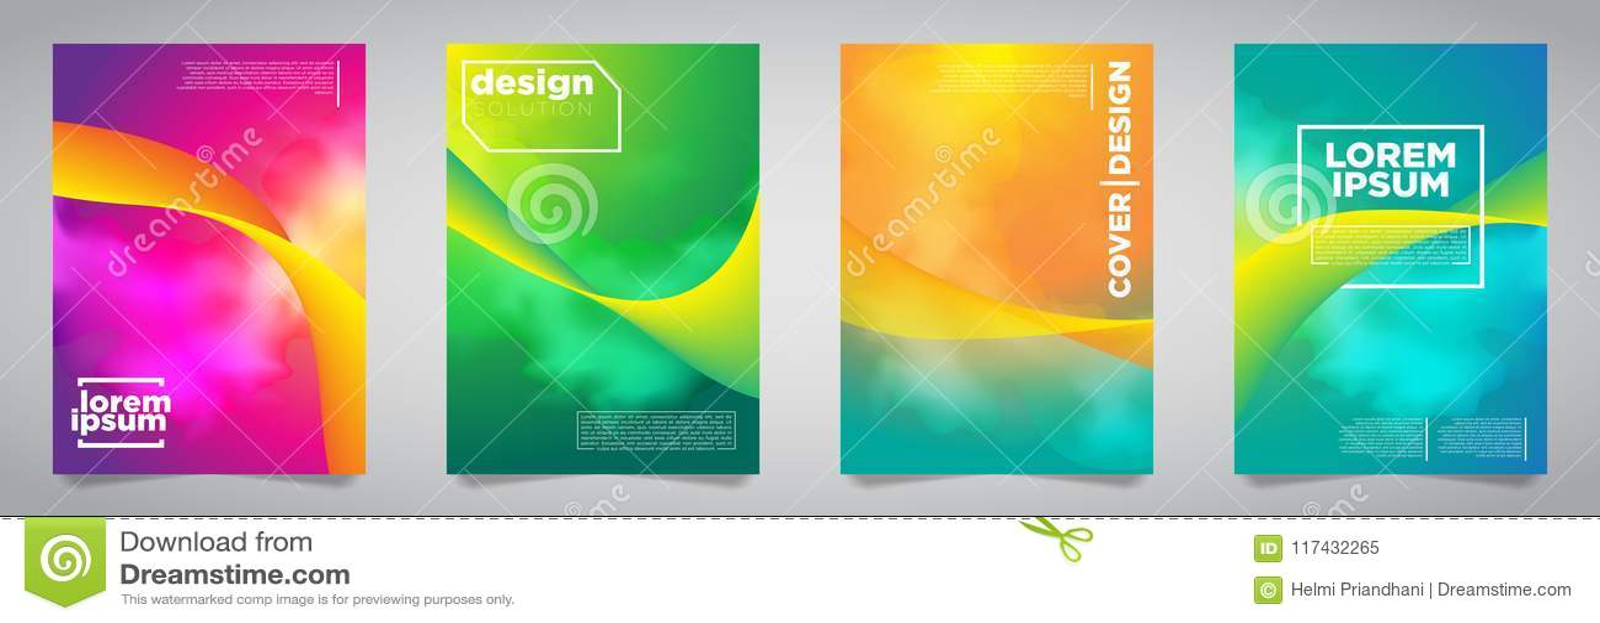 Colorful Futuristic Minimalist Covers Design. EPS10 Vector Illustration.